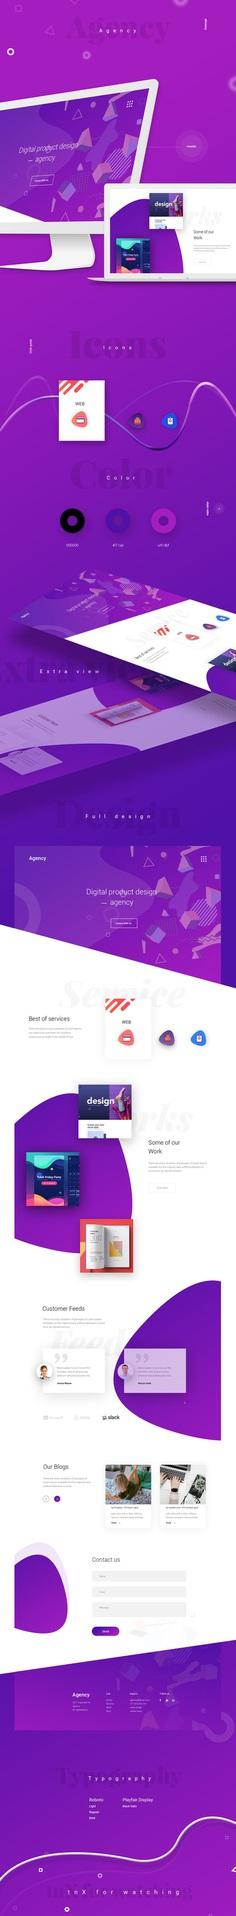 Agency - Web Design on Behance